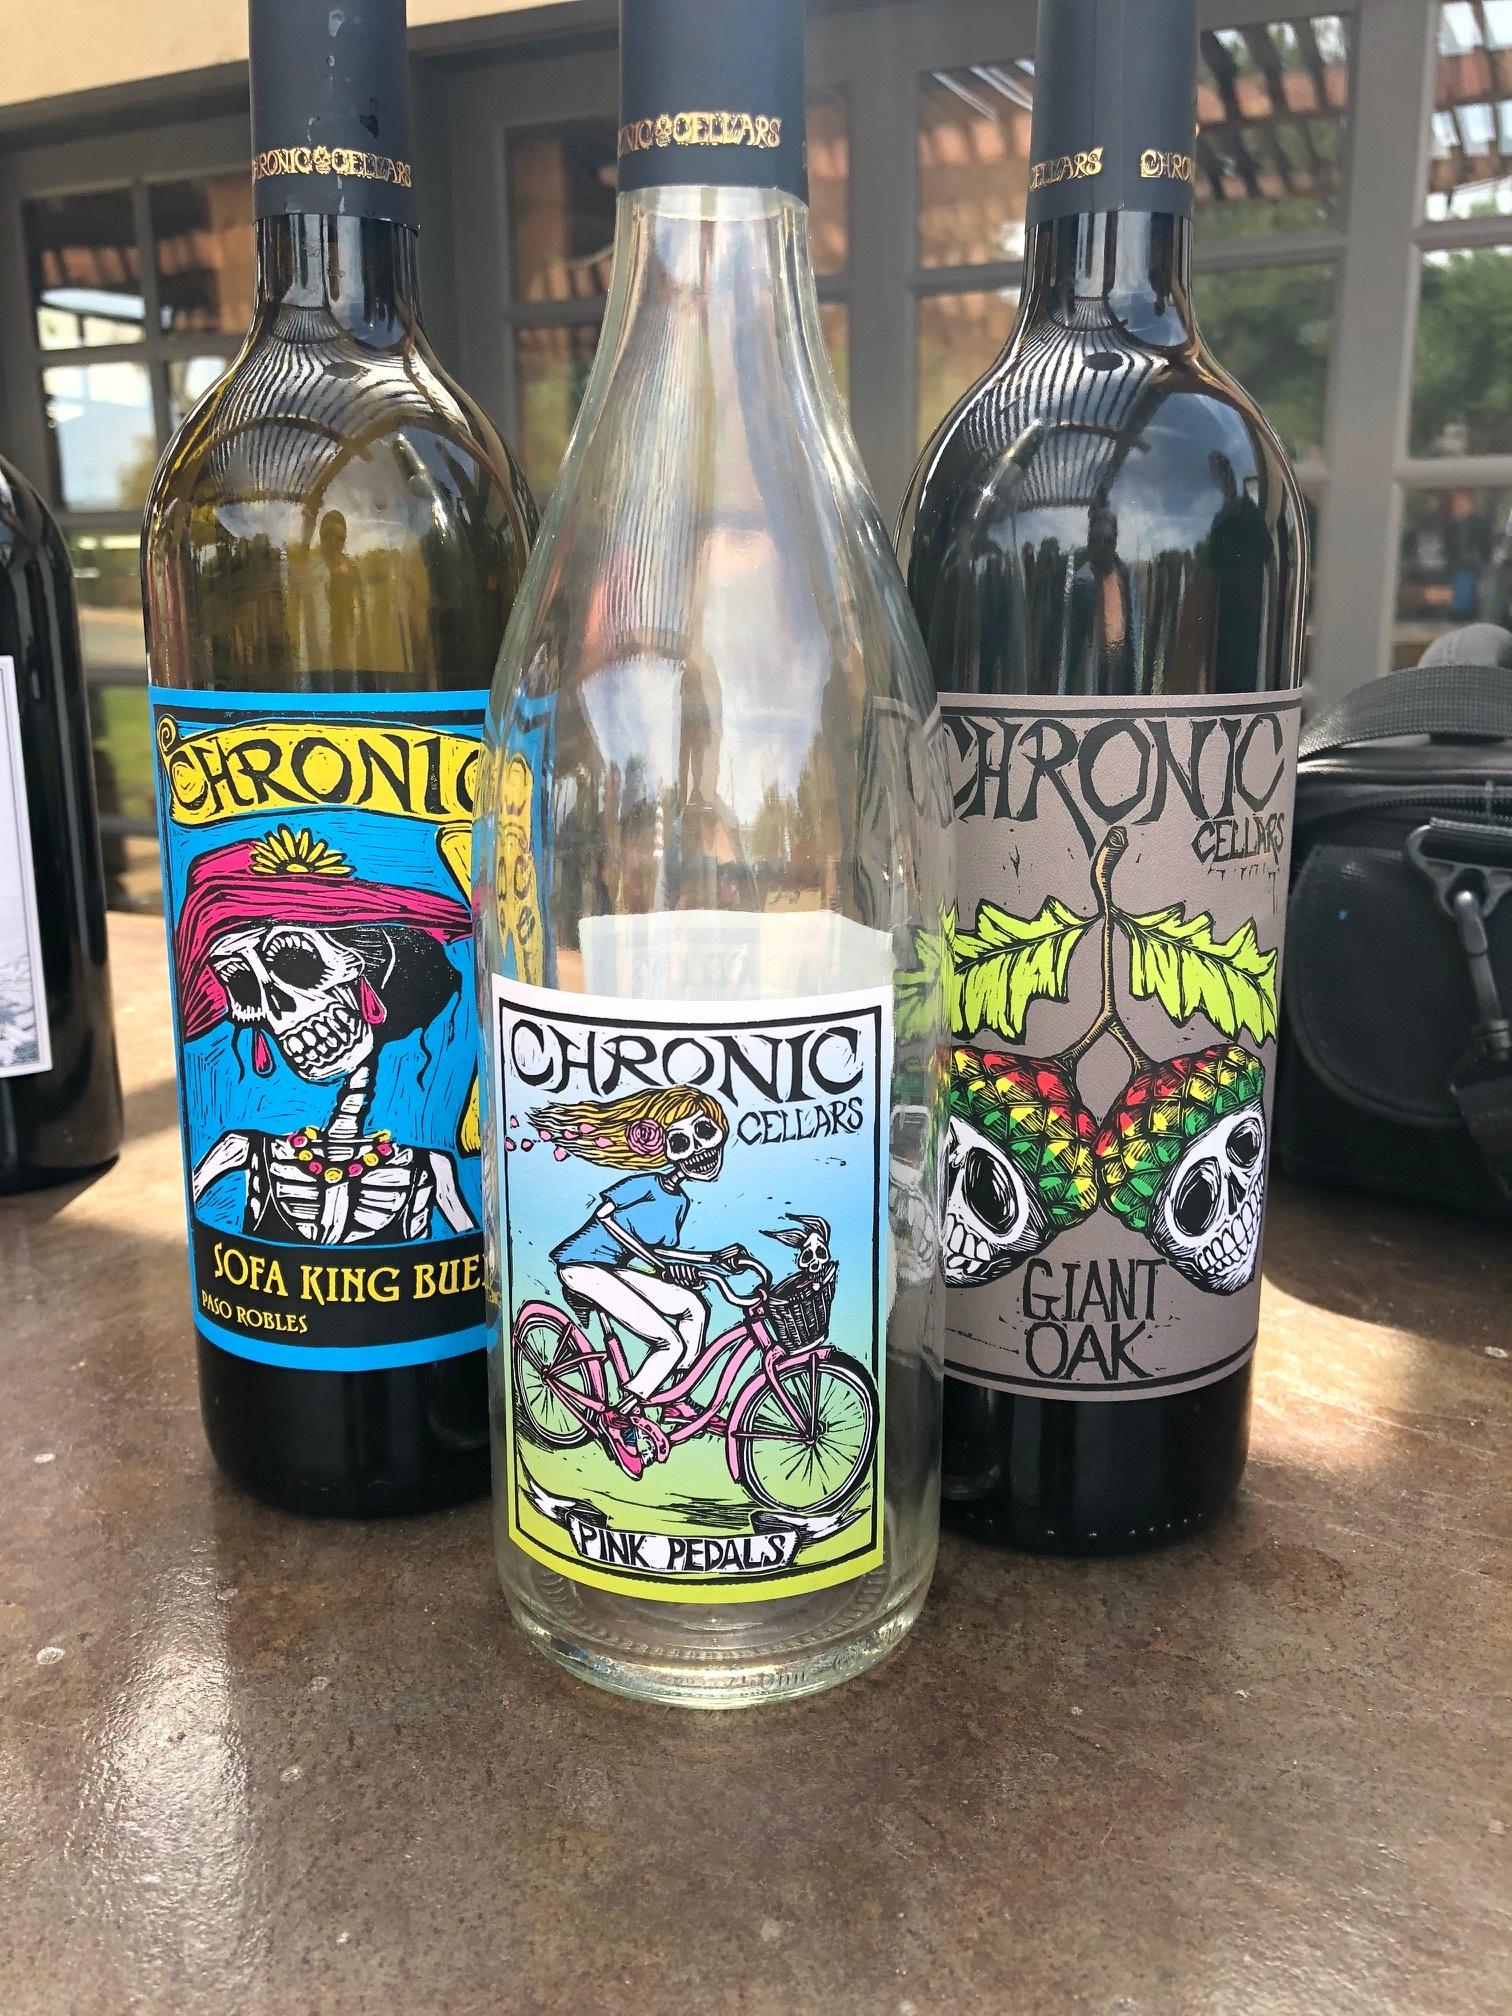 Chronic Cellars Wine.jpg